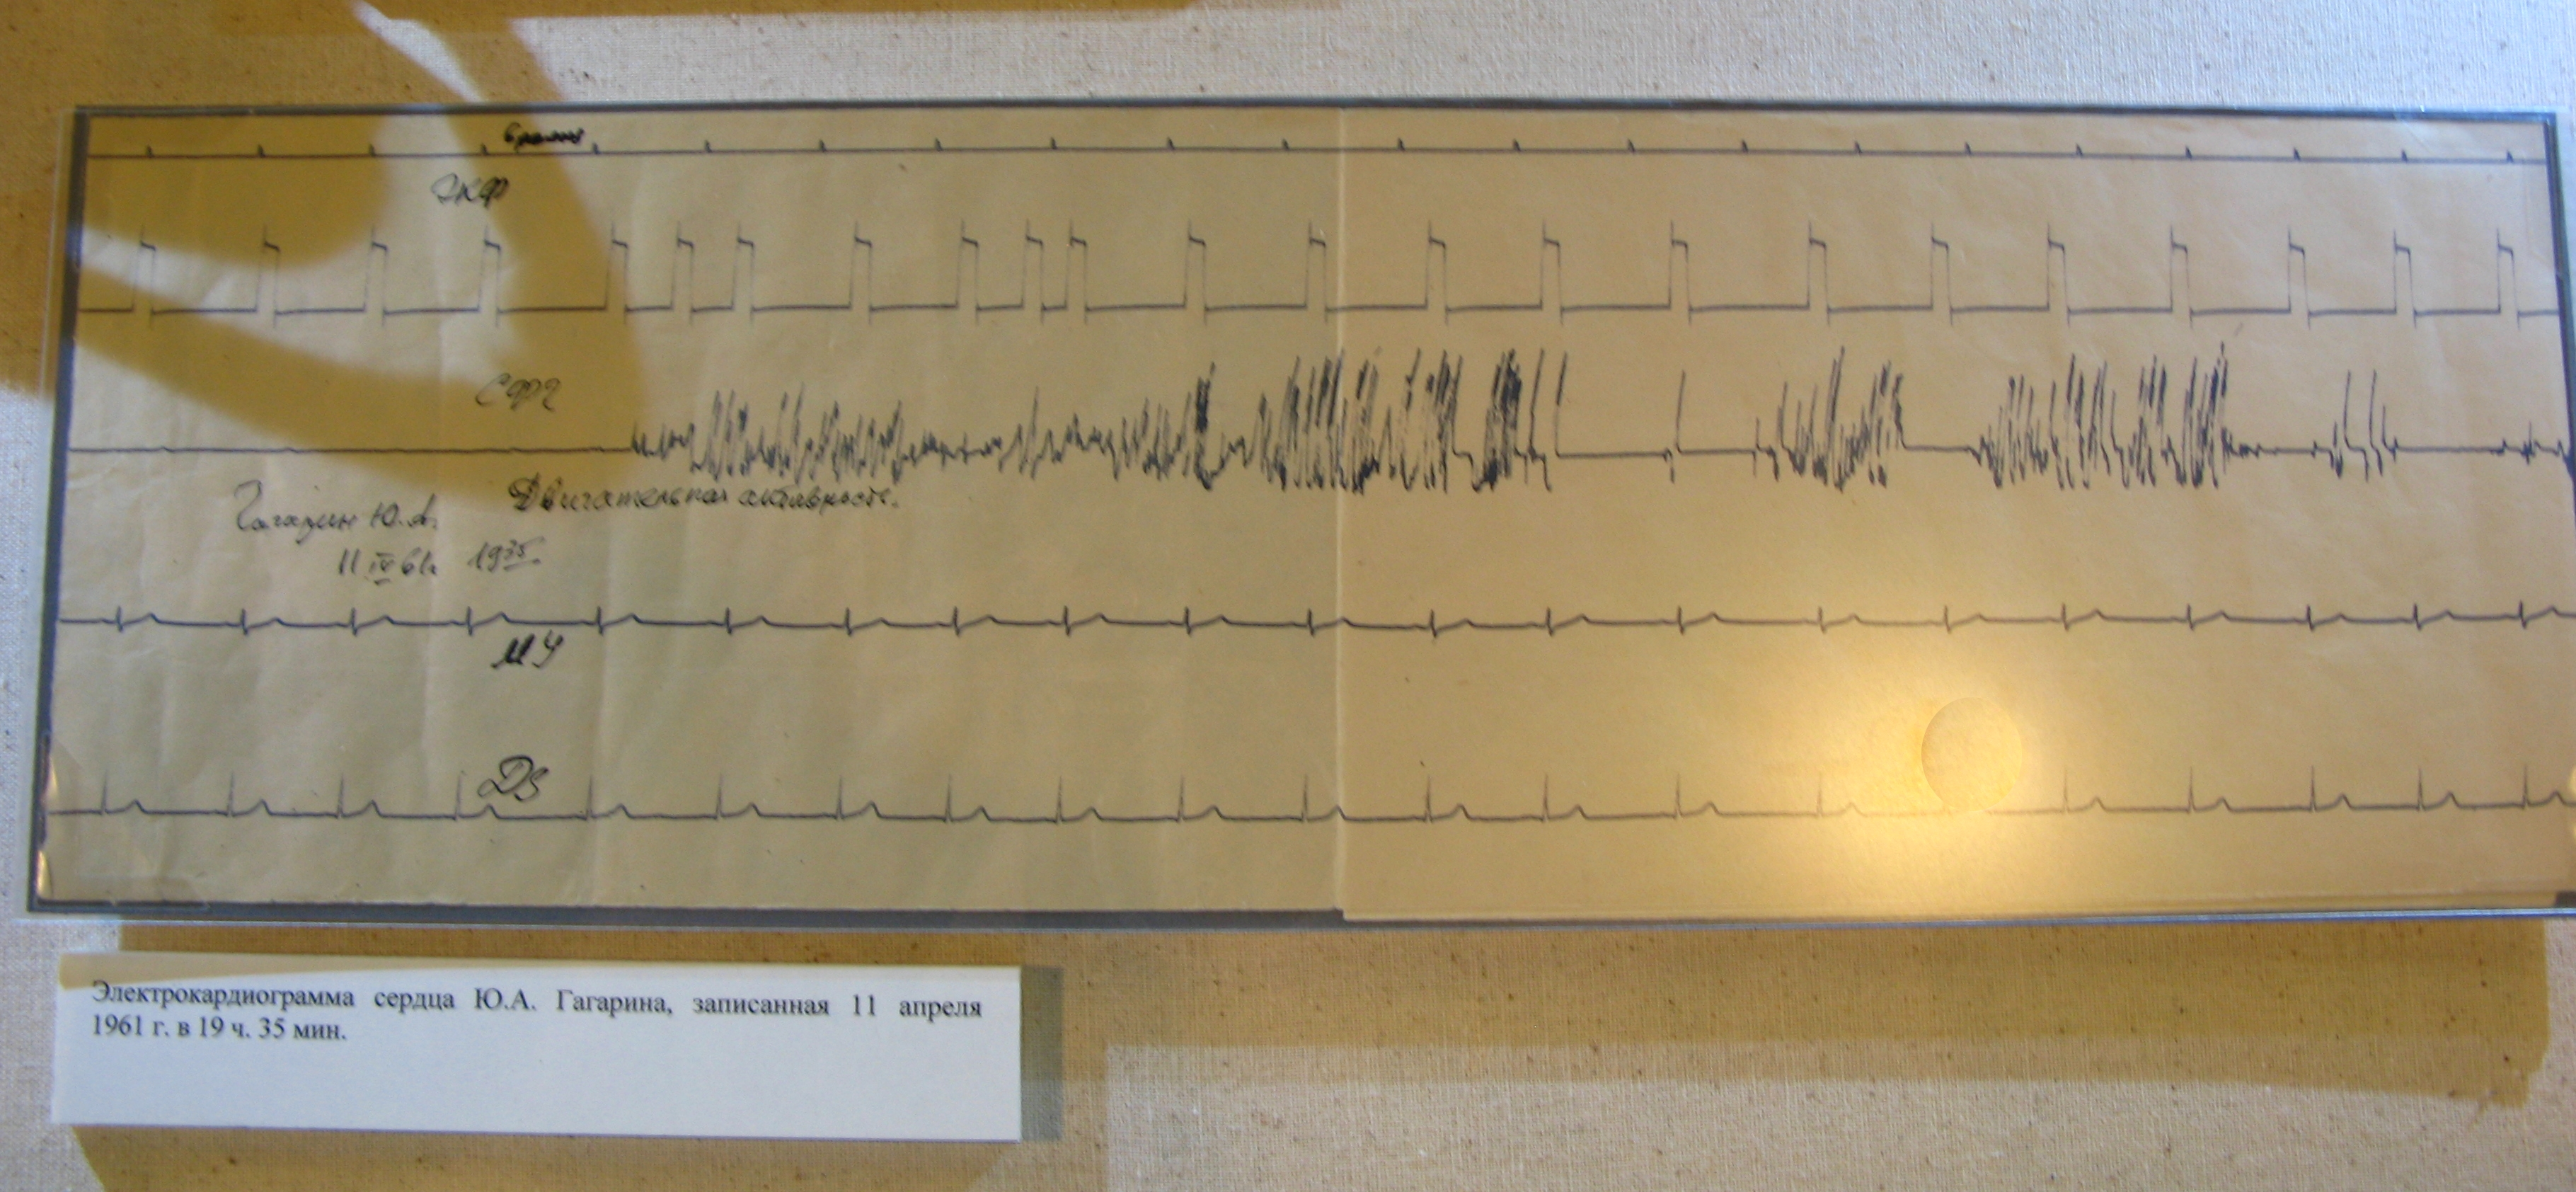 Jurij Gagarin cardiogram.JPG